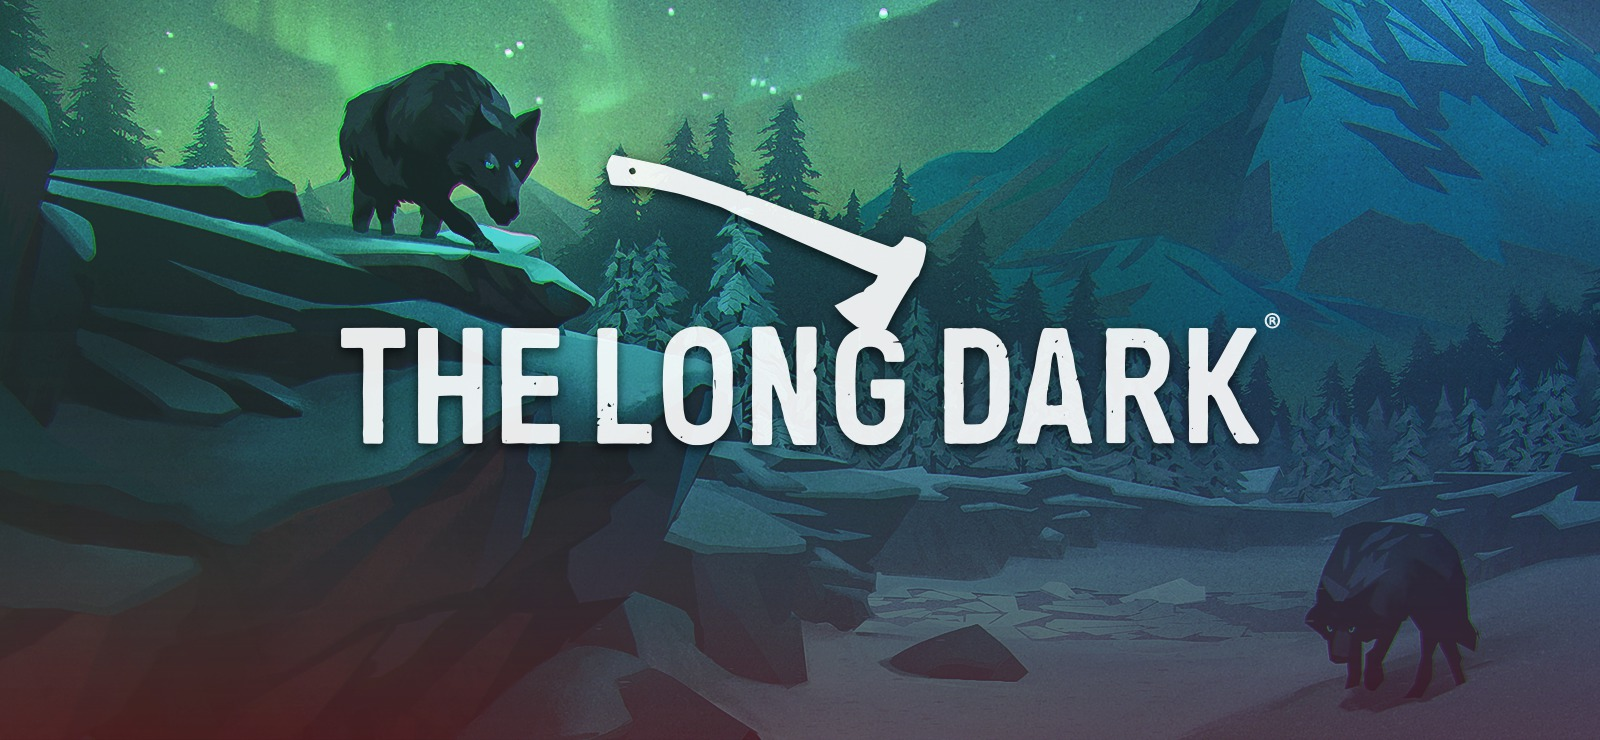 the-long-dark-download-xgamex